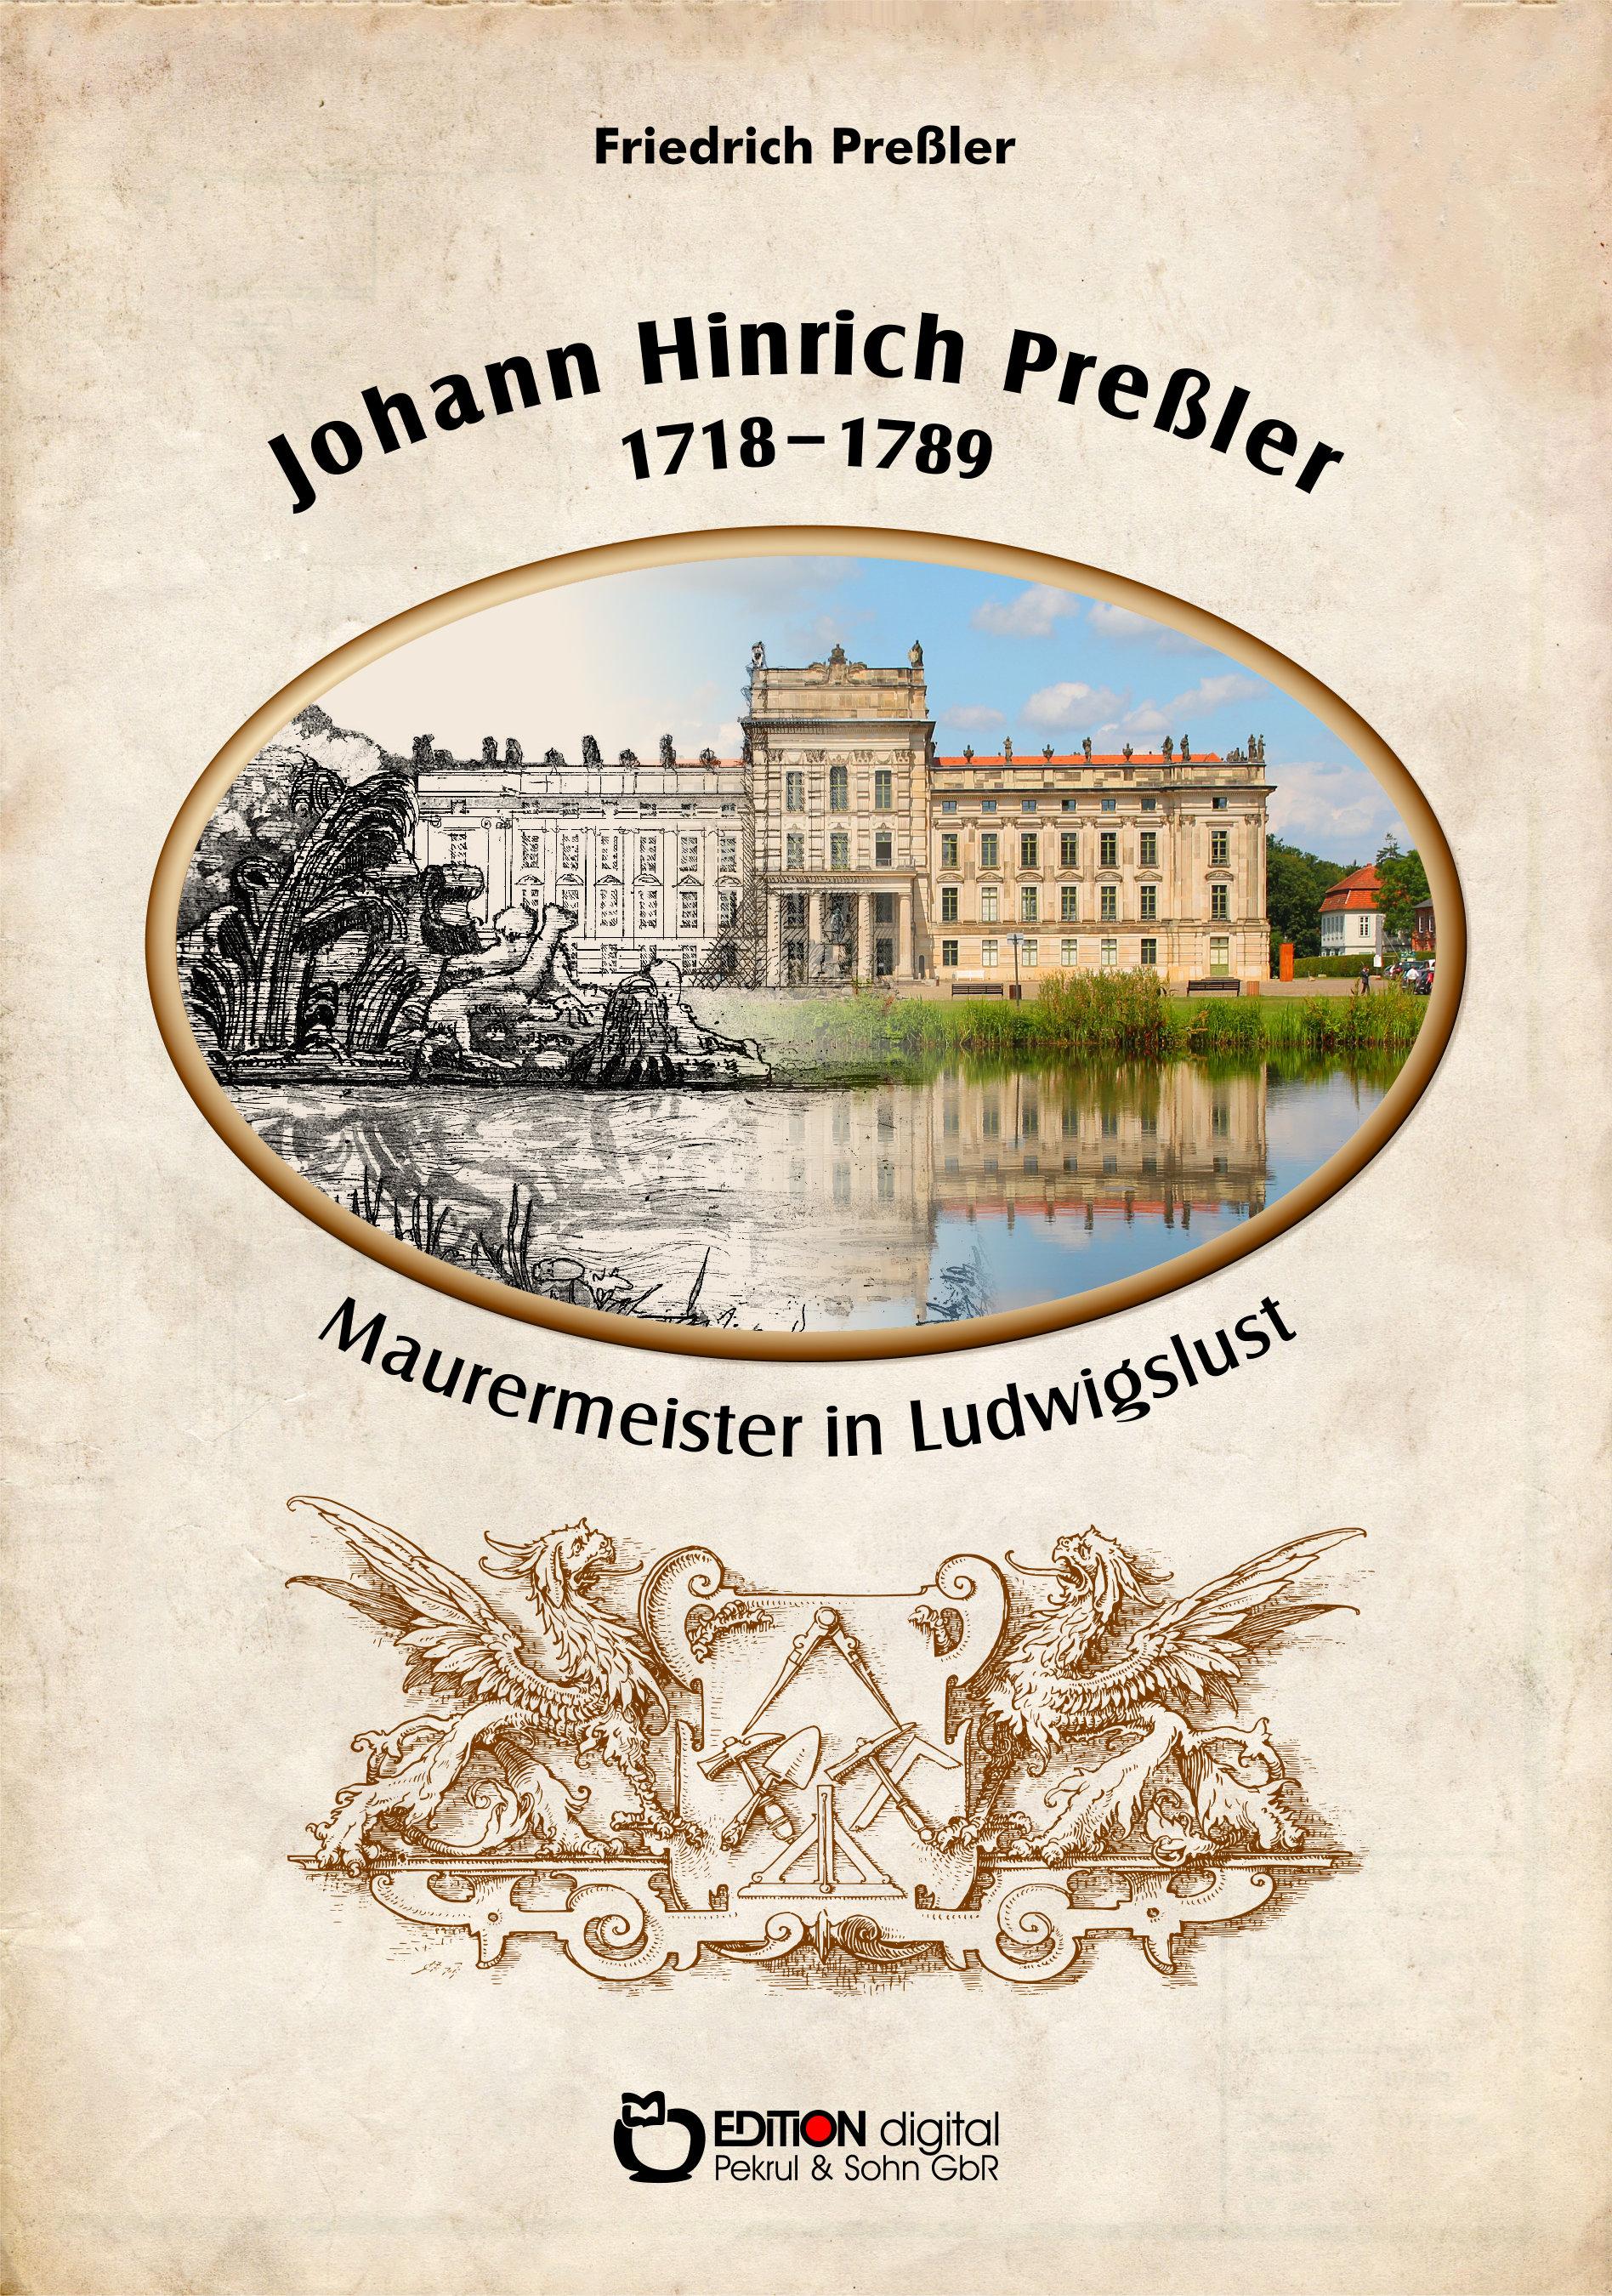 Johann Hinrich Preßler 1718-1789. Maurermeister in Ludwigslust von Friedrich Preßler